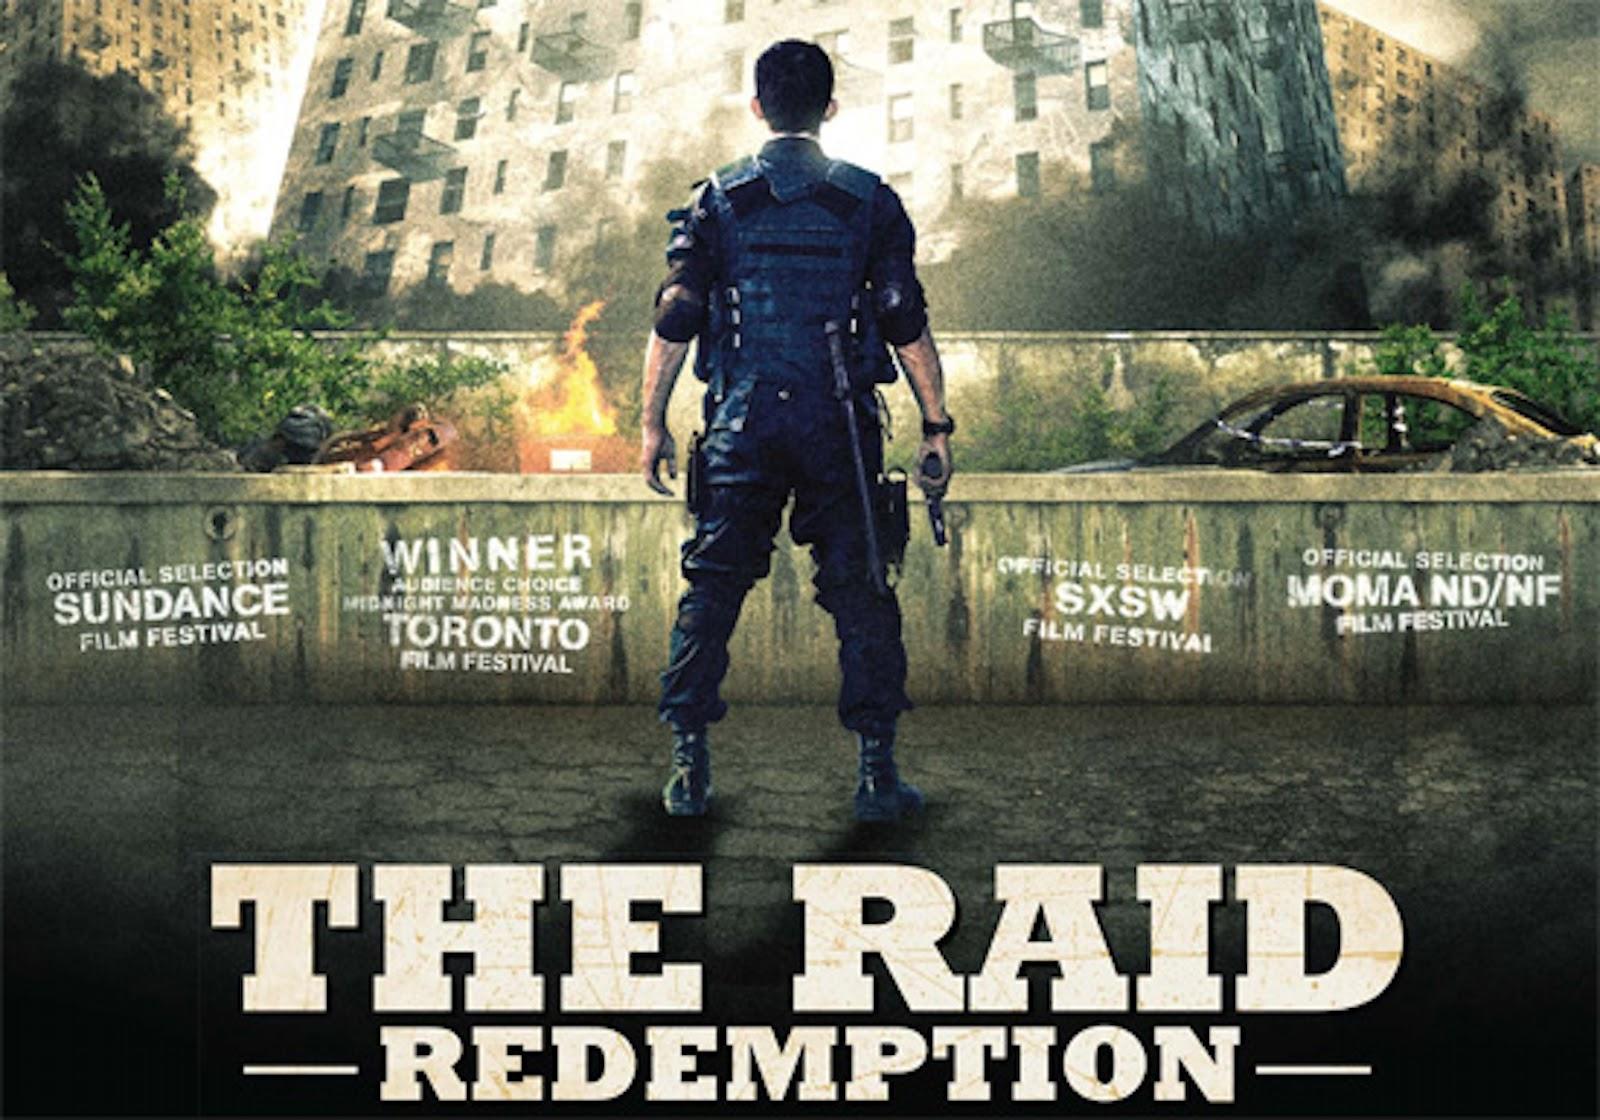 The Raid-Redemption